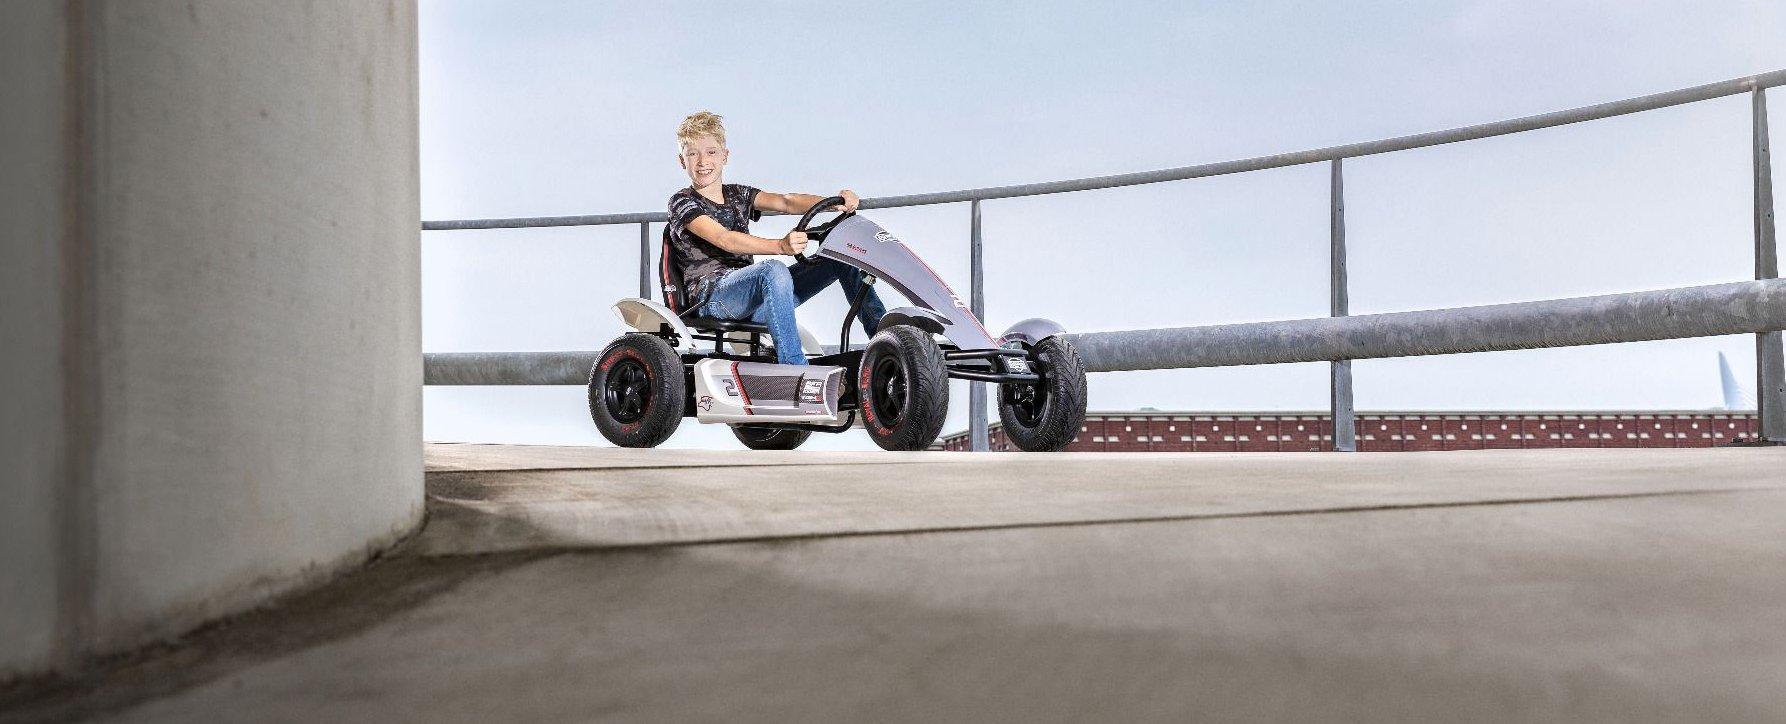 BFR-3 Gokarts - wie hier der BERG Race GTS - bescheren besonders viel Fahrspaß - gokart-profi.de